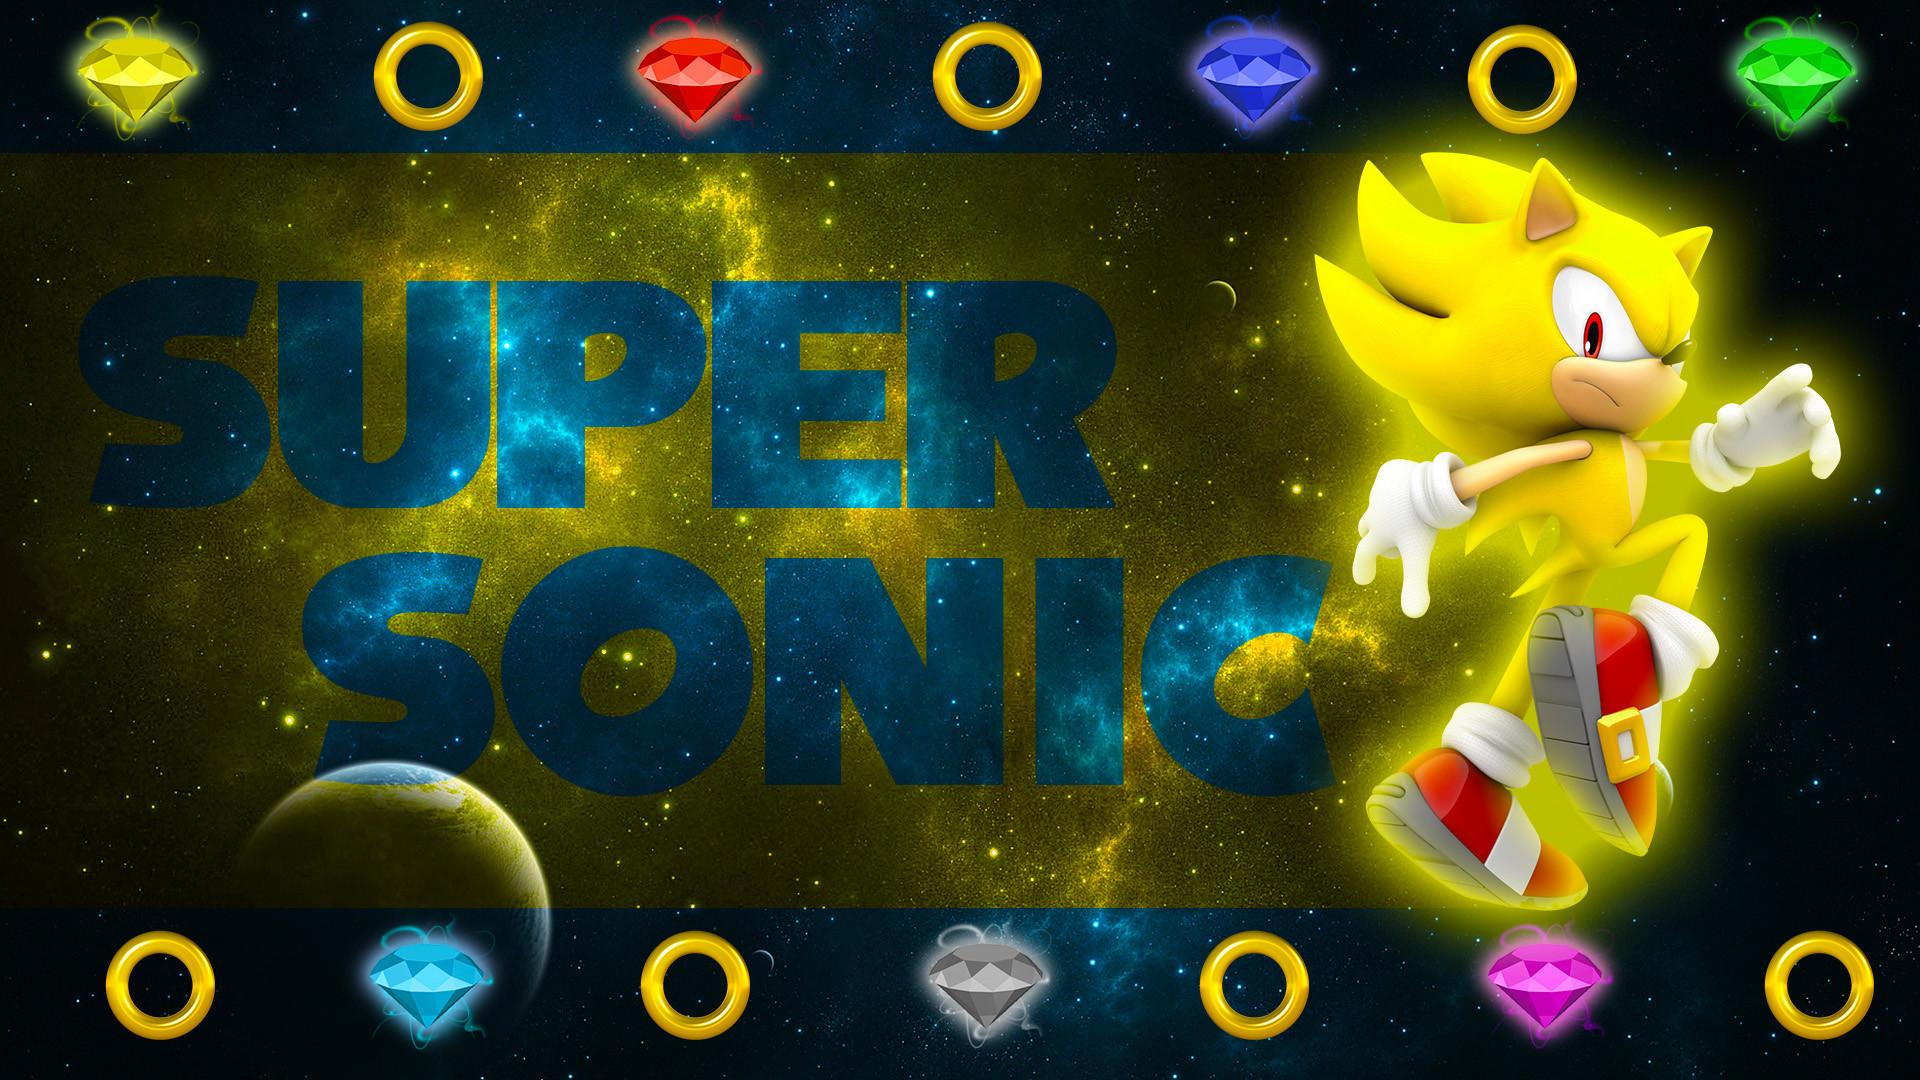 Super Sonic Wallpaper 72 Pictures